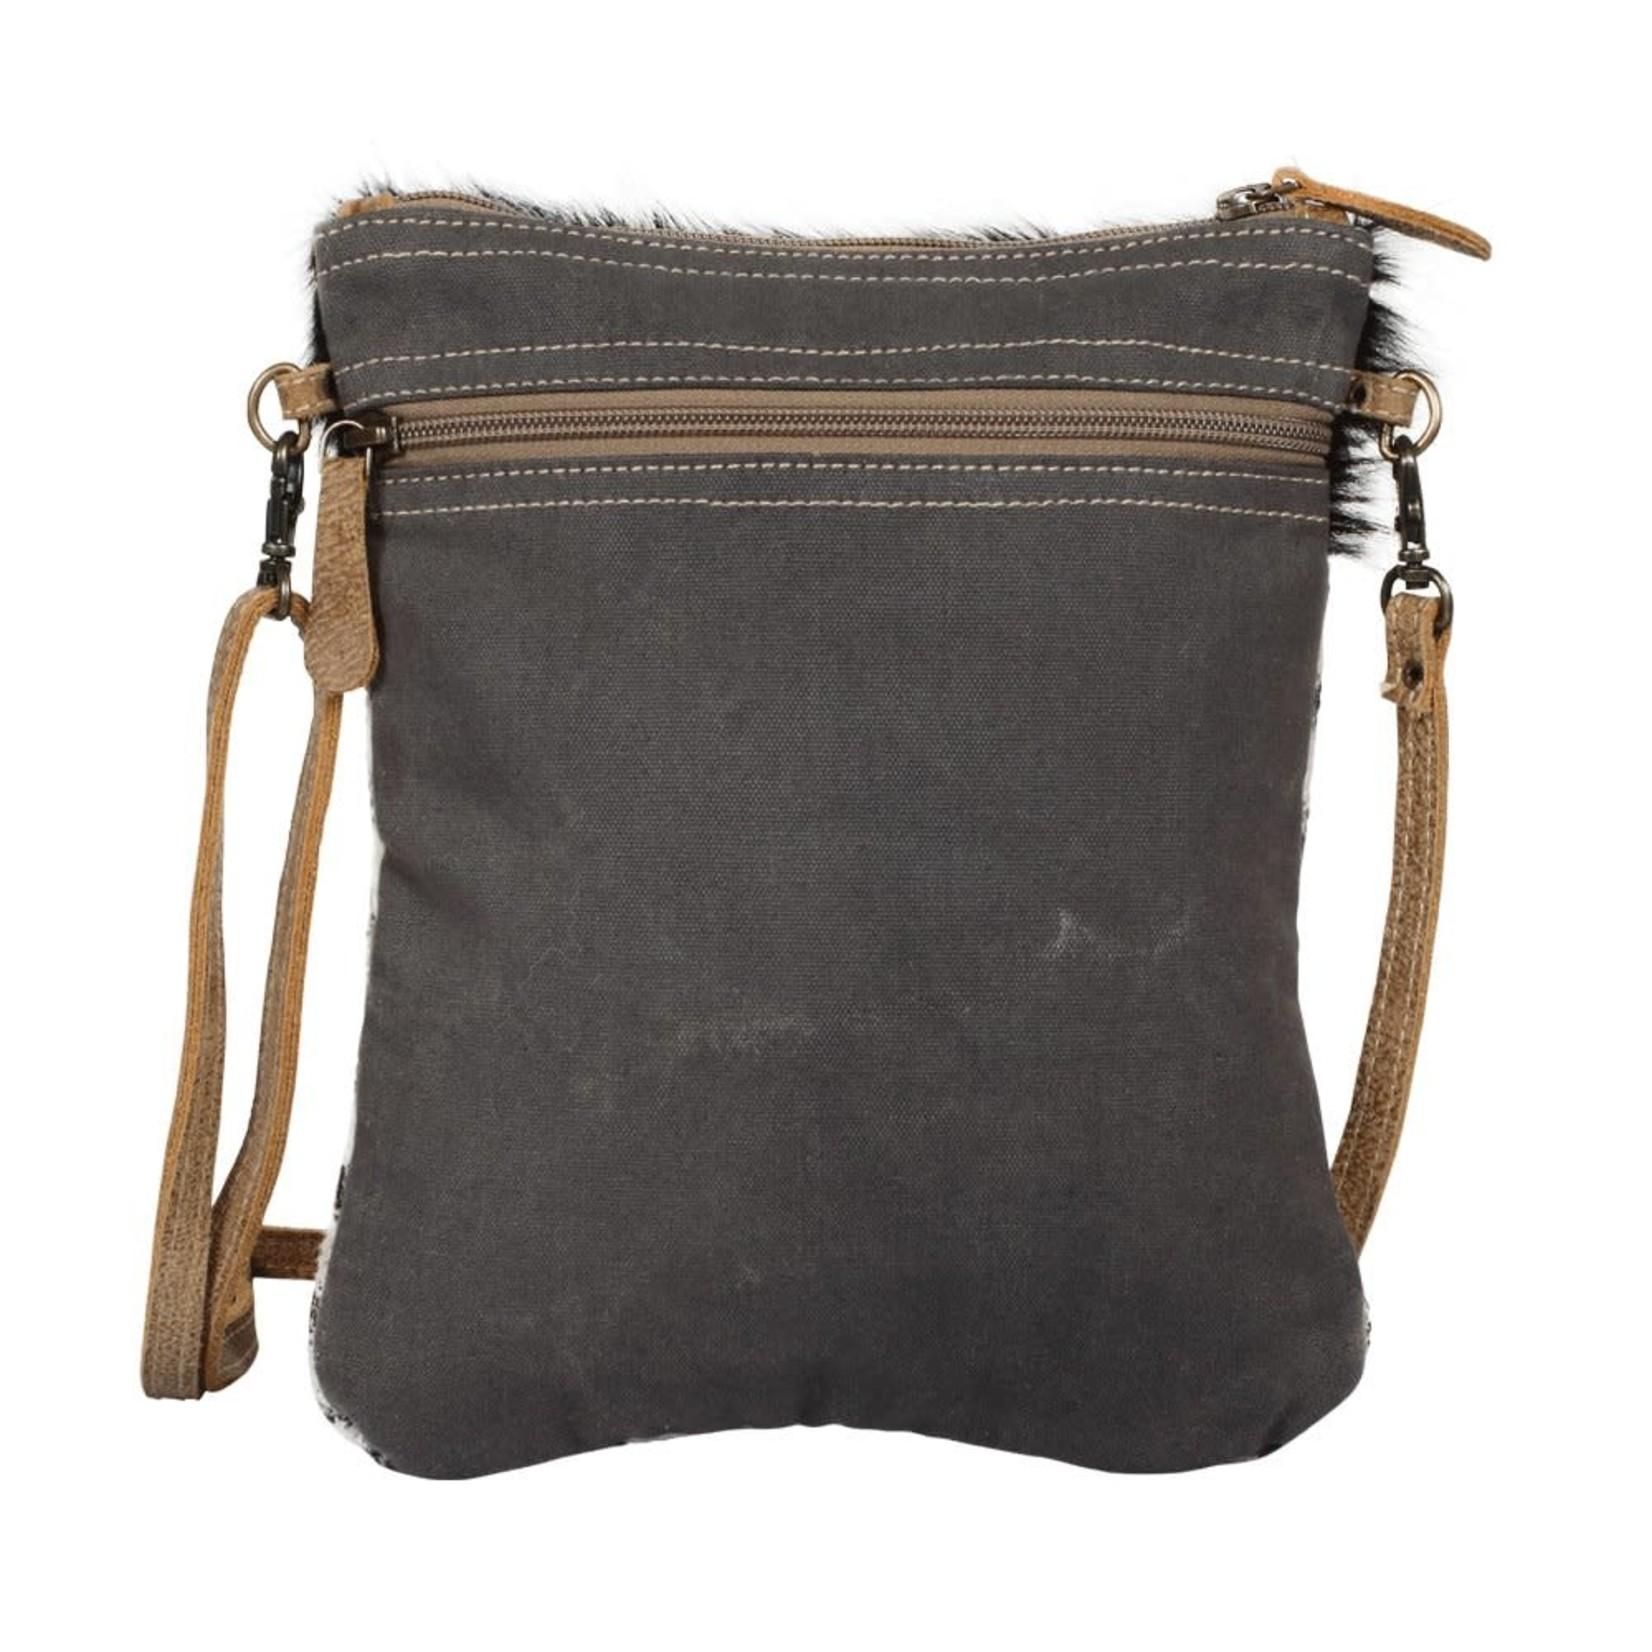 Myra Bags S-1346 Spleen Small & Crossbody Bag